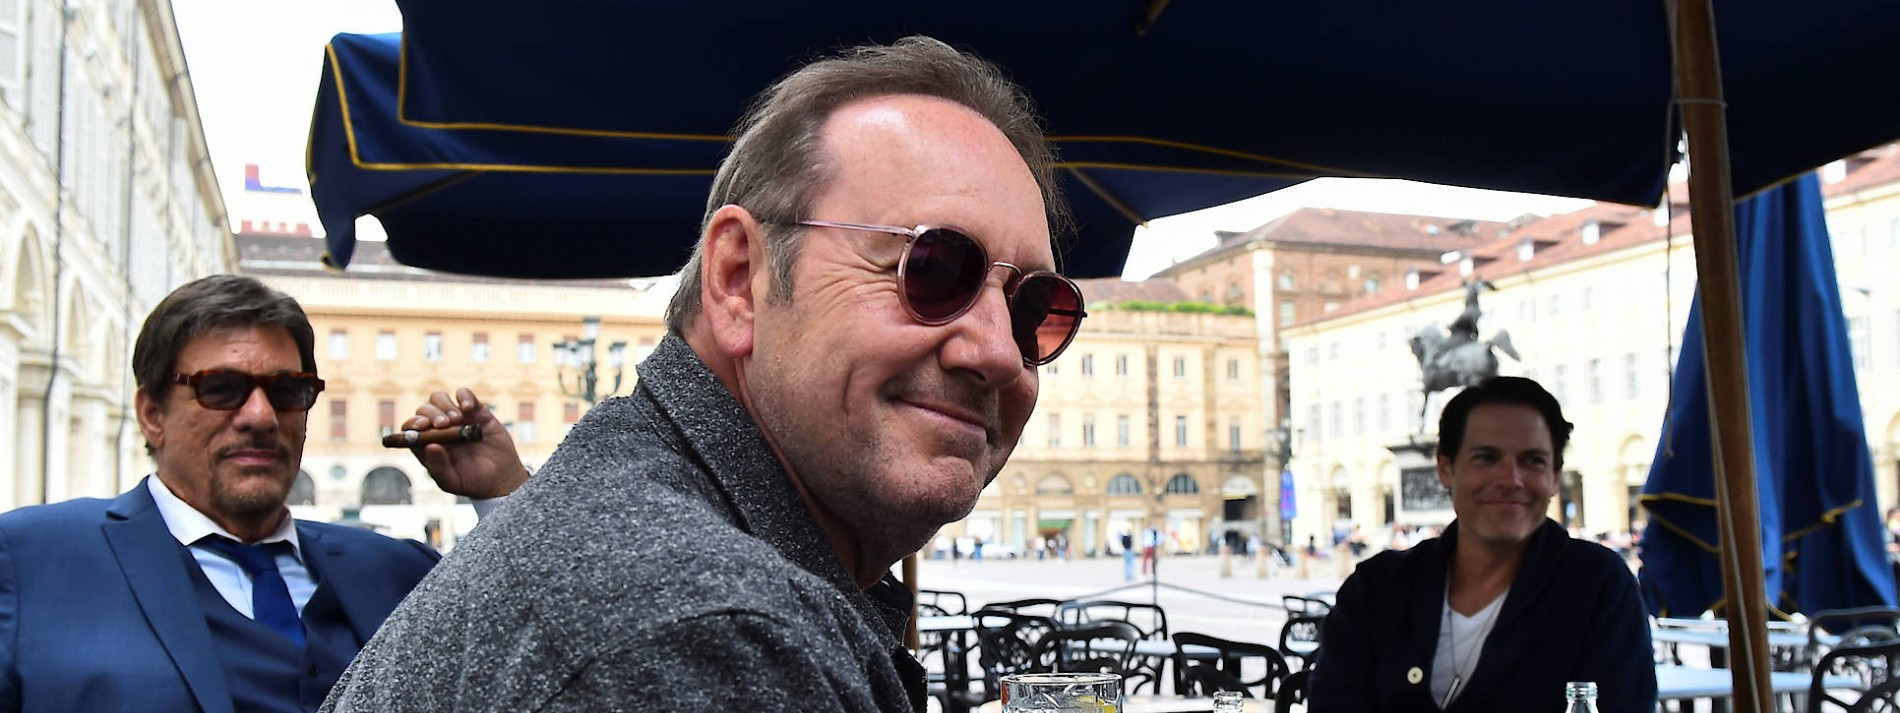 Kevin Spacey gibt Comeback bei Dreharbeiten in Italien